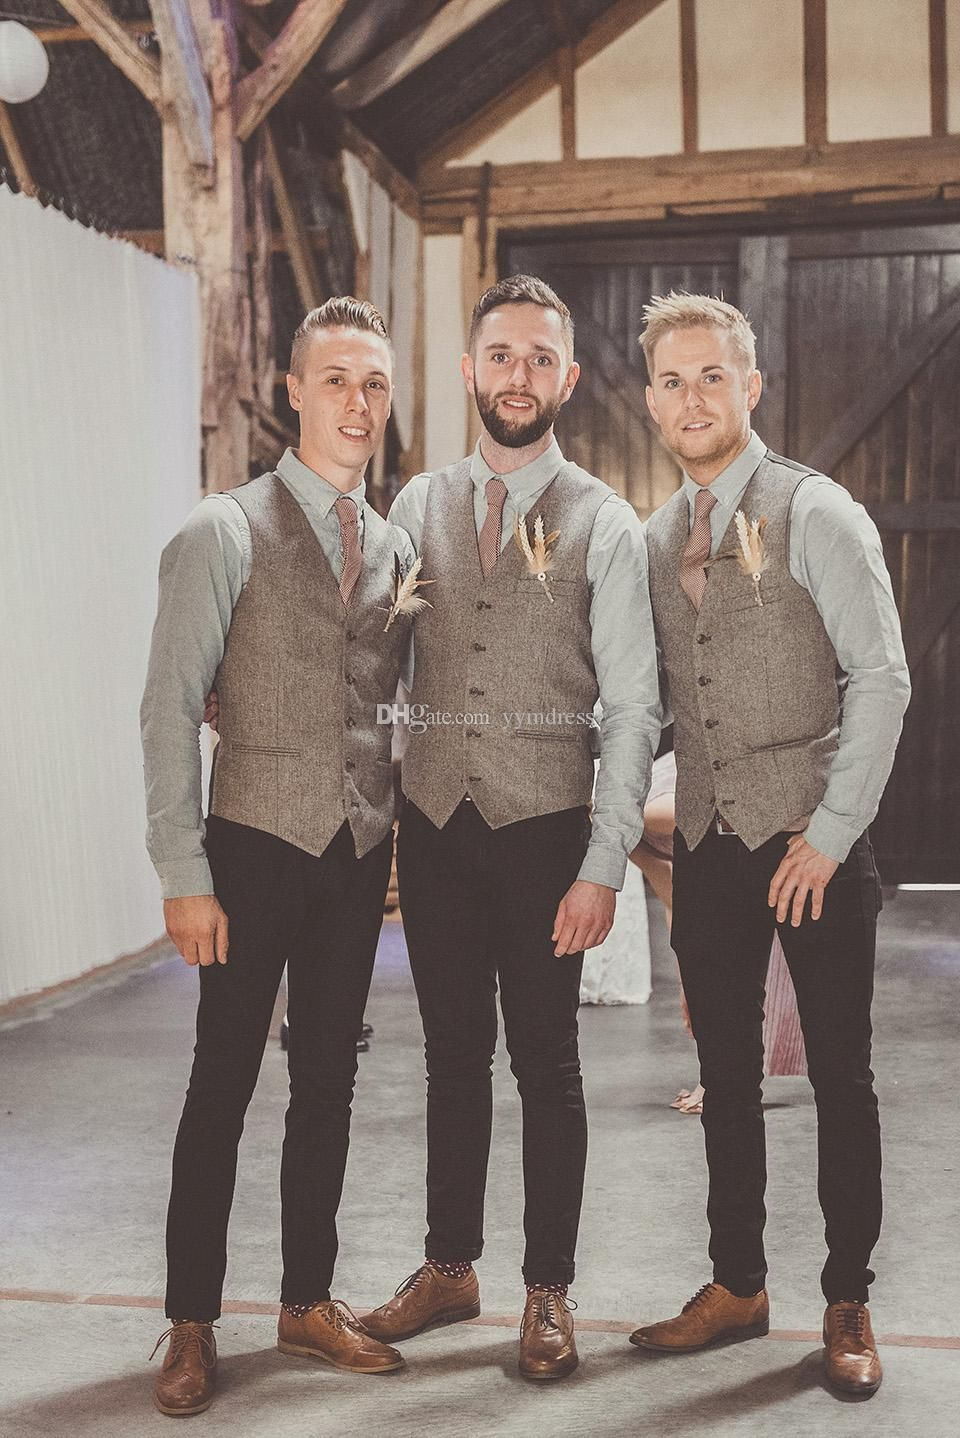 2020 Modest Wool Groom Vests British Style Mens Suit Vests Slim Fit Mens Dress Vest Wedding Waistcoat Groomsmen Attire Custom Made Vests For Weddings Wedding At Fall Barn Wedding Wedding Waistcoats